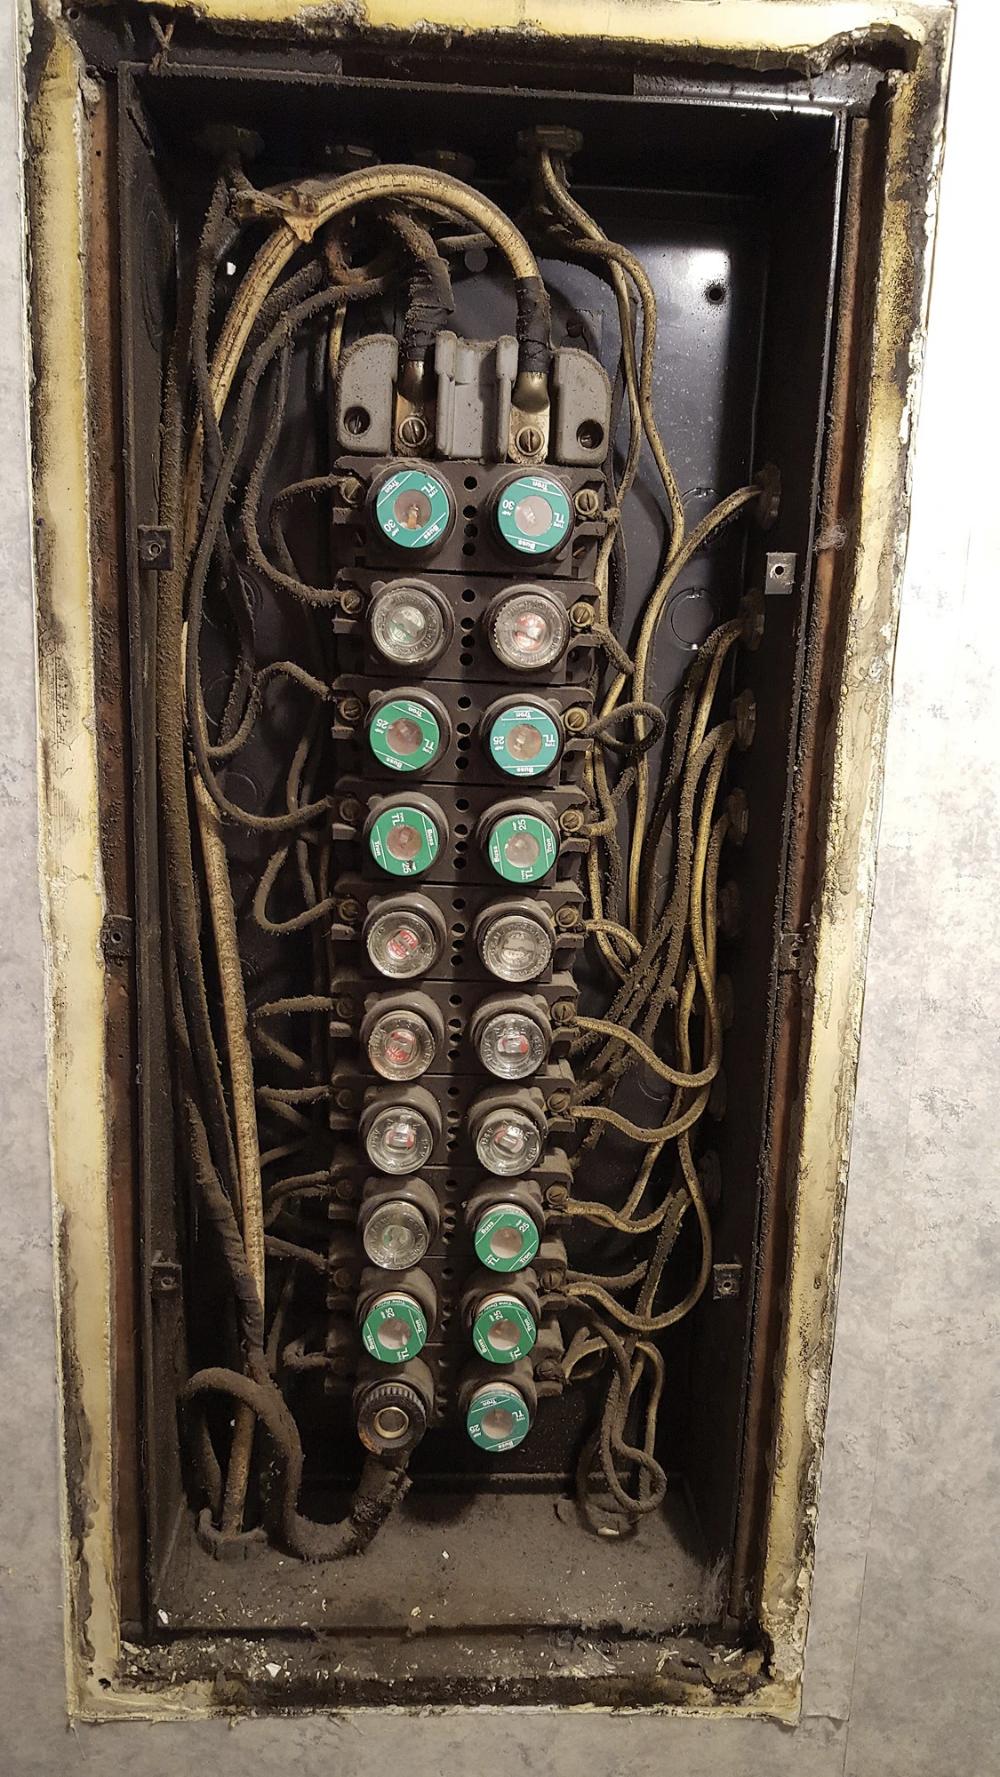 house fuse box wiring an attic - wiring diagram export end-bitter -  end-bitter.congressosifo2018.it  congressosifo2018.it